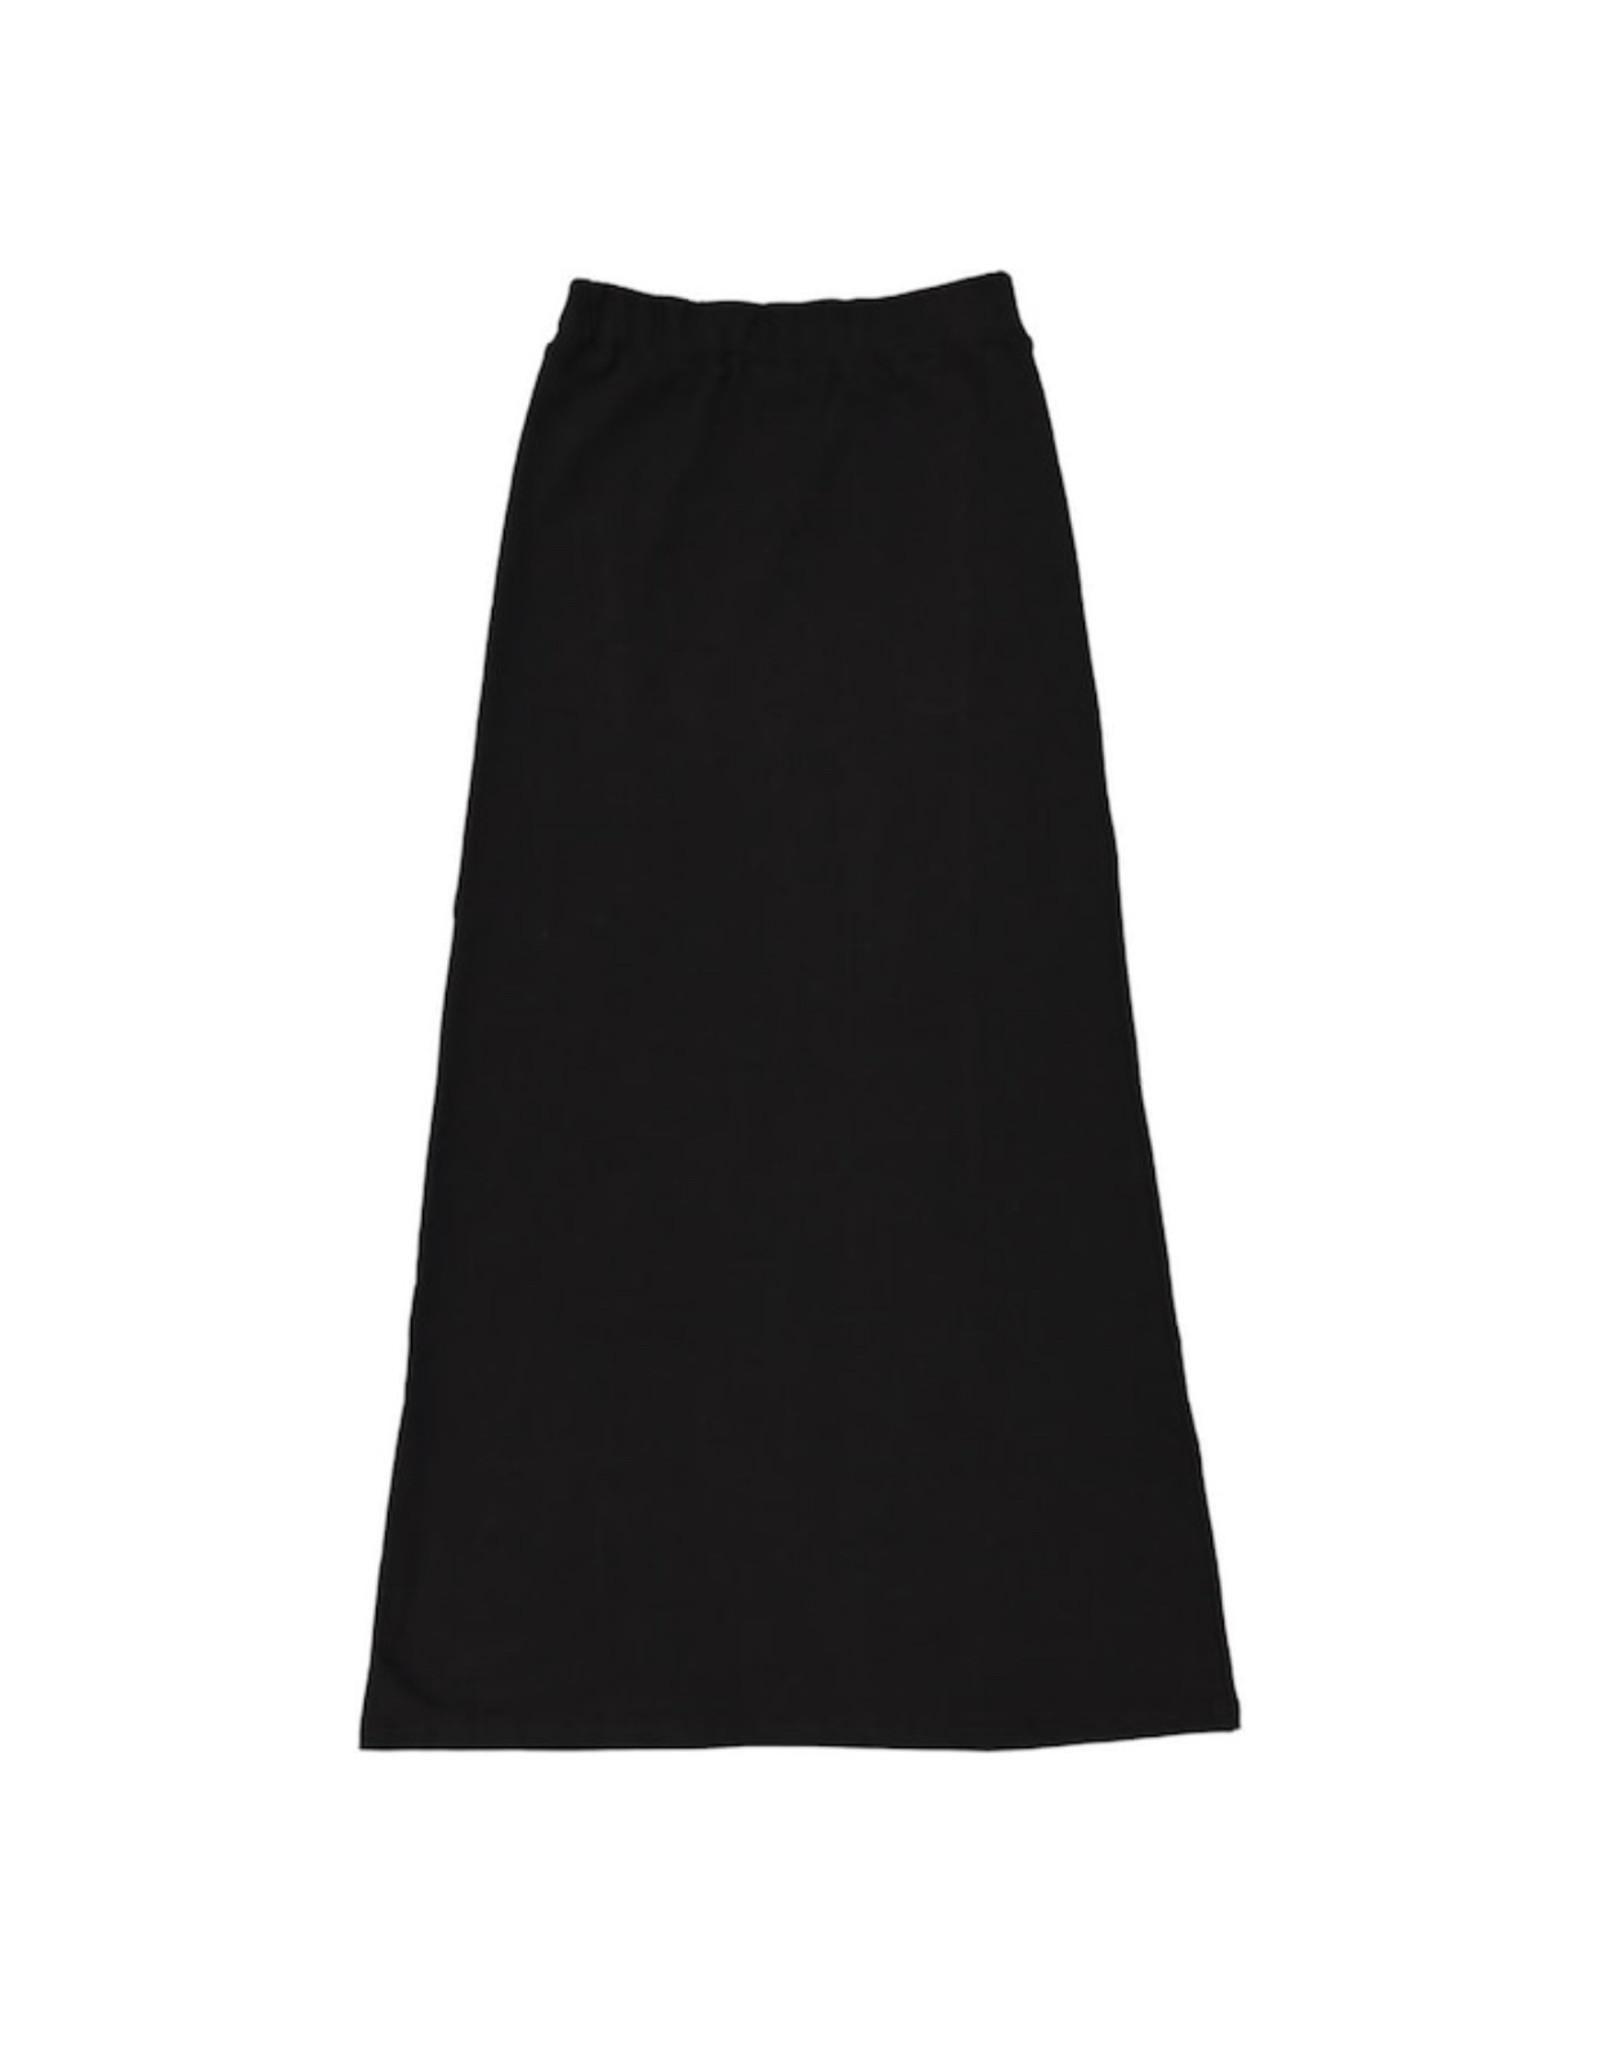 Kiki Riki Kiki Riki Women's Long Cotton A Line Skirt 4946